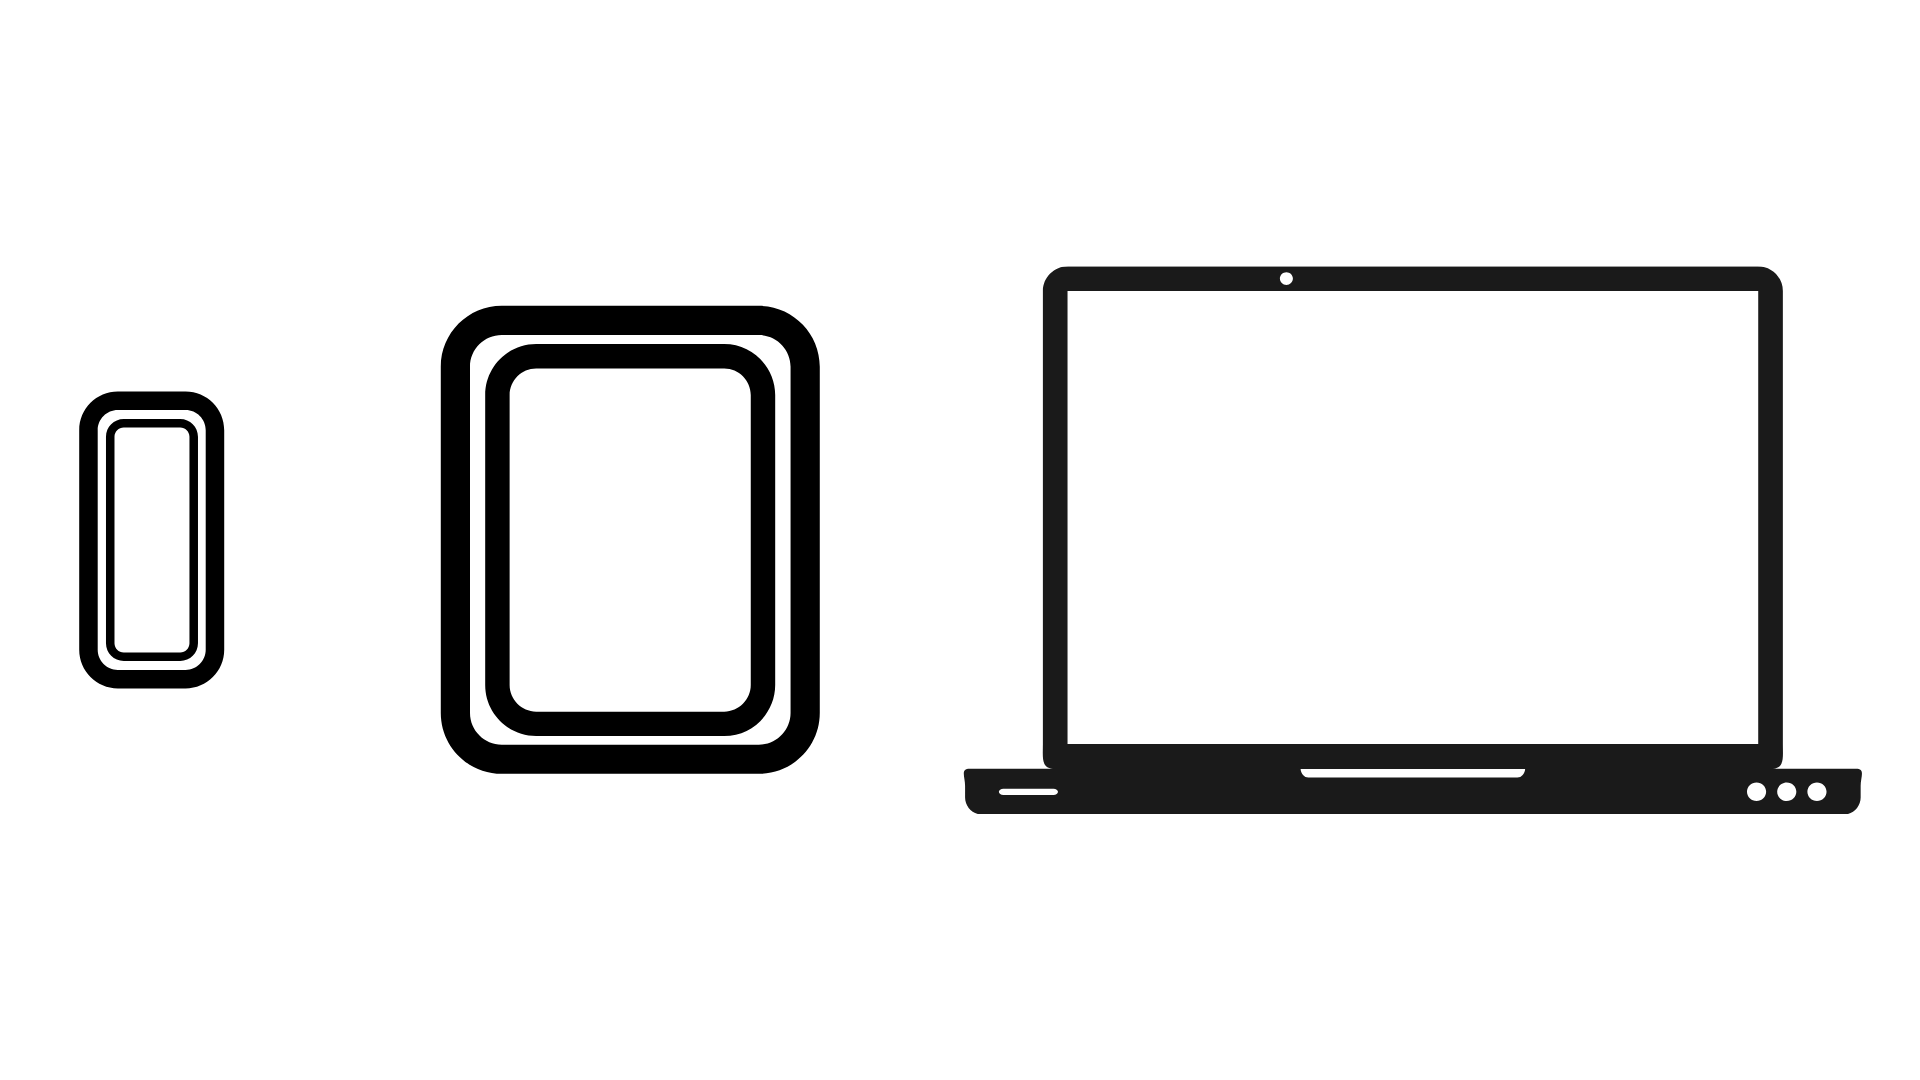 écran responsive